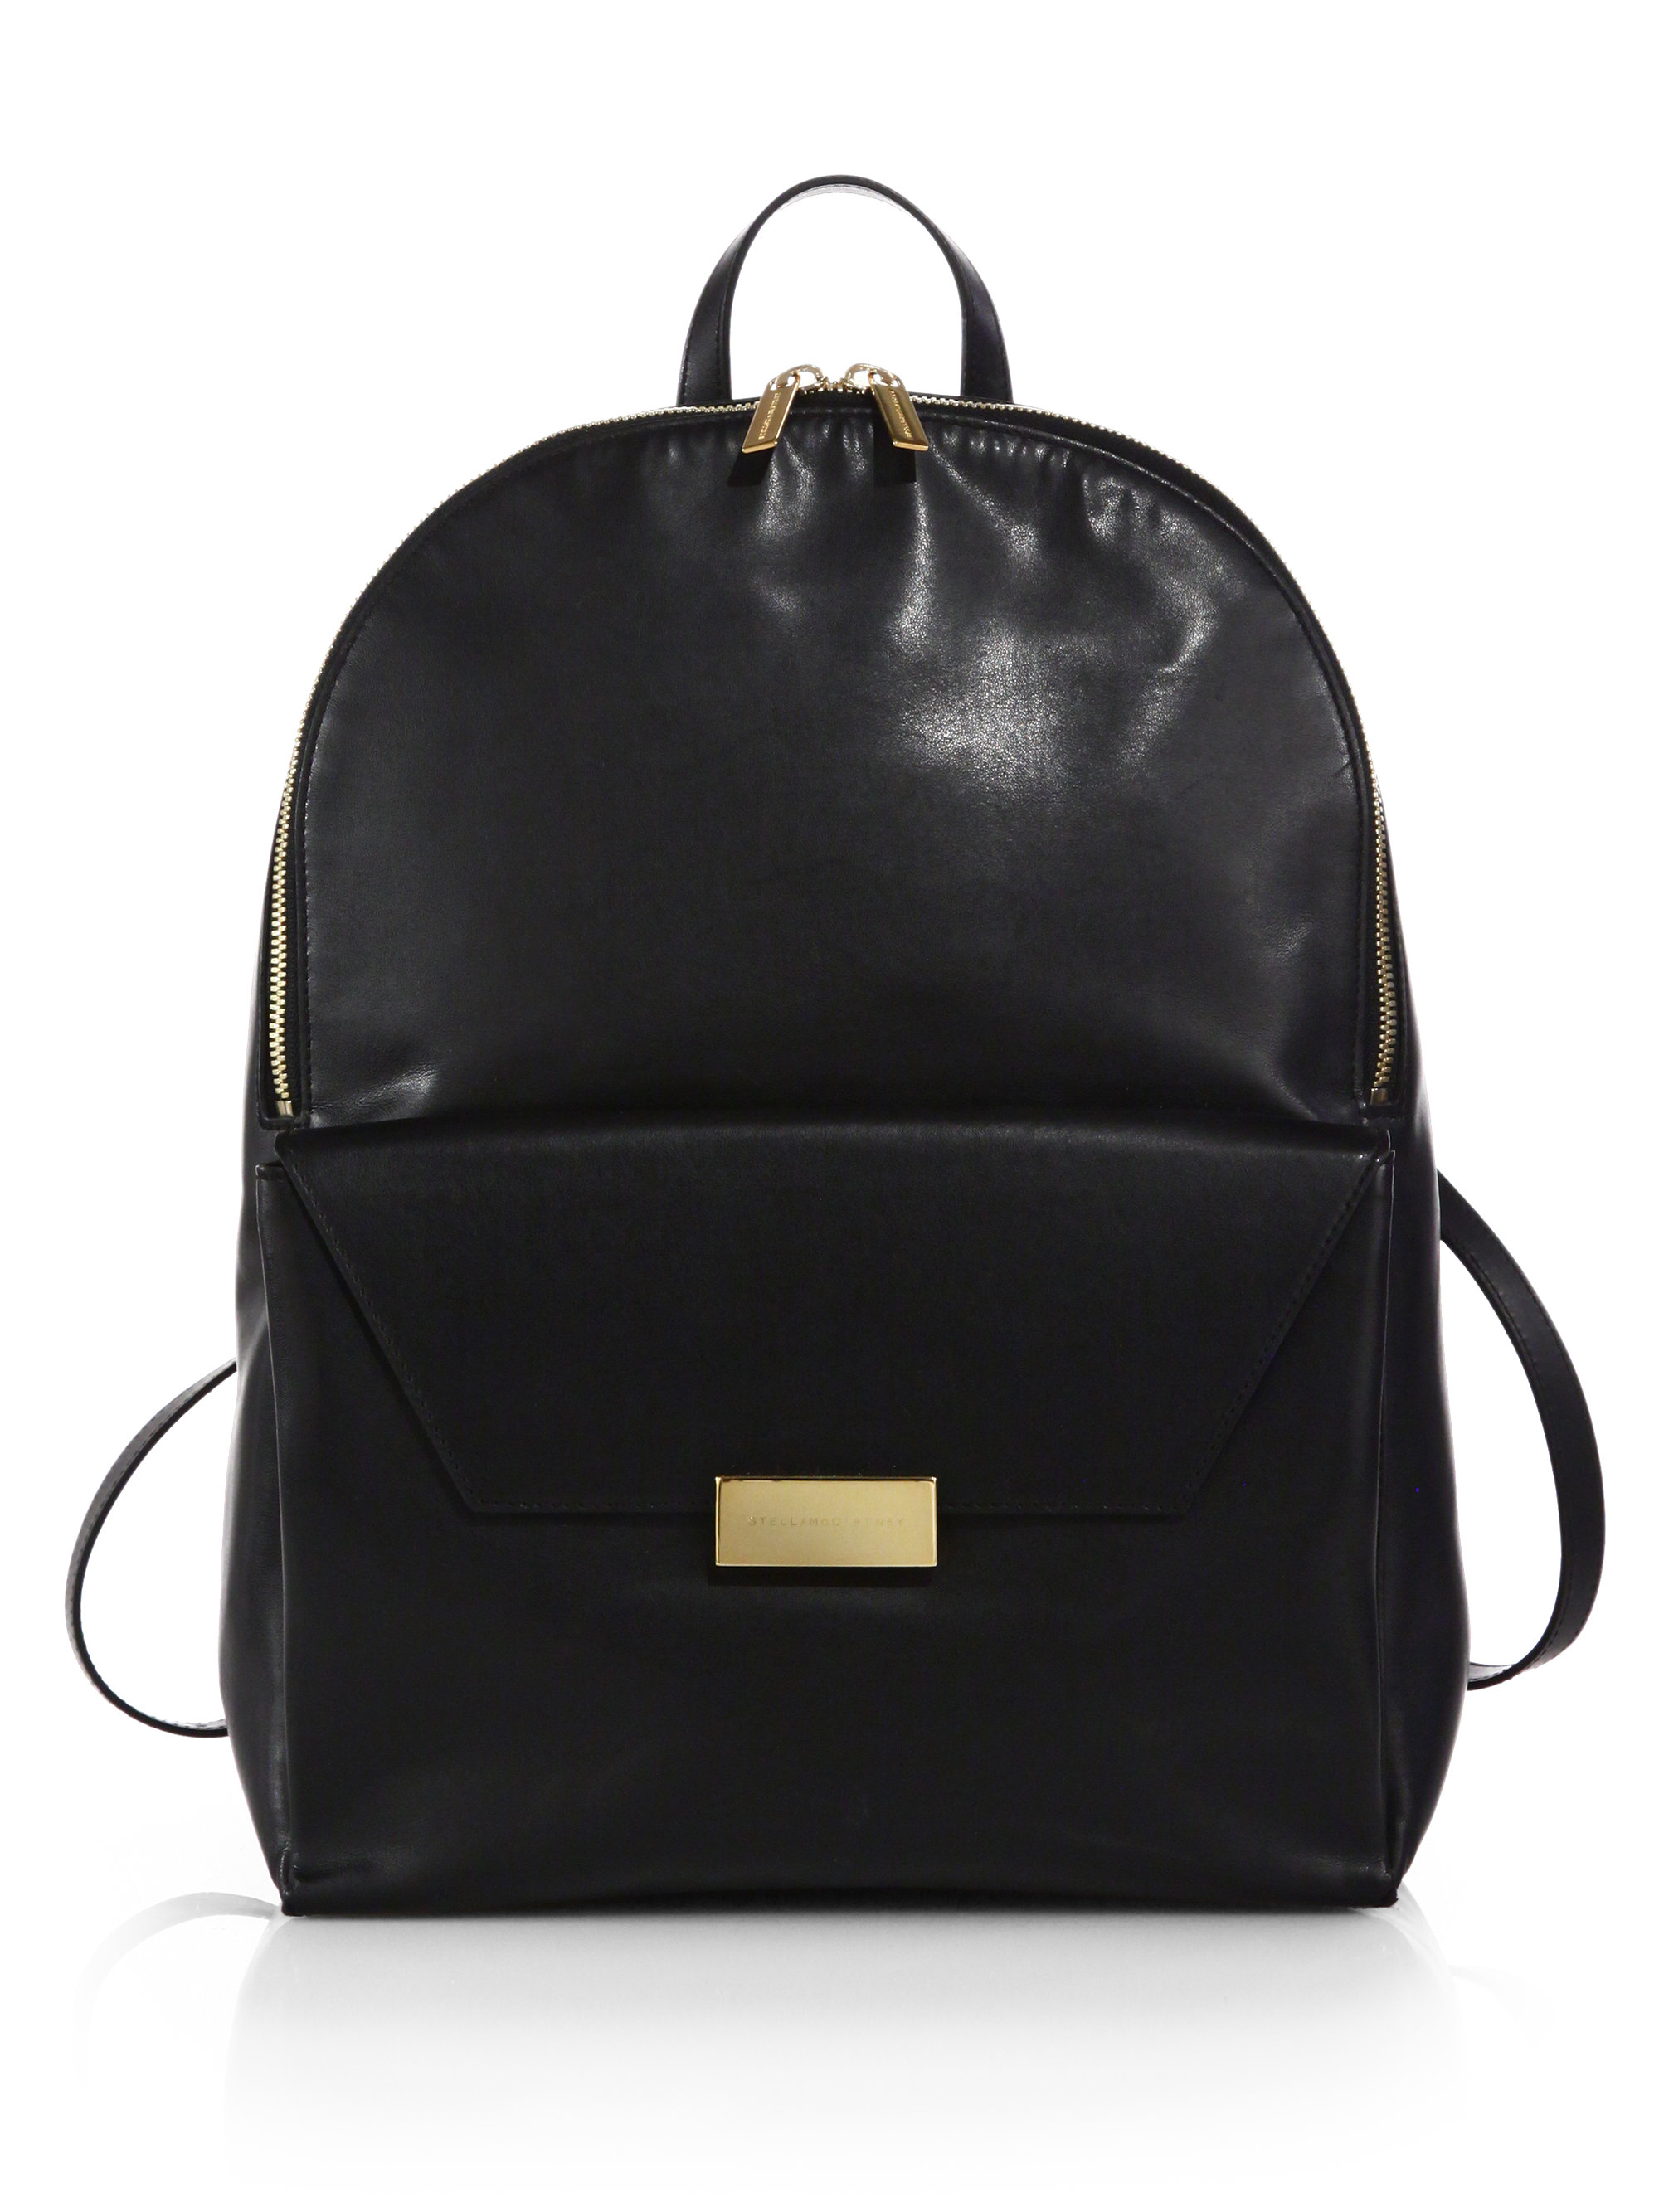 Stella mccartney Beckett Faux Leather Backpack in Black | Lyst